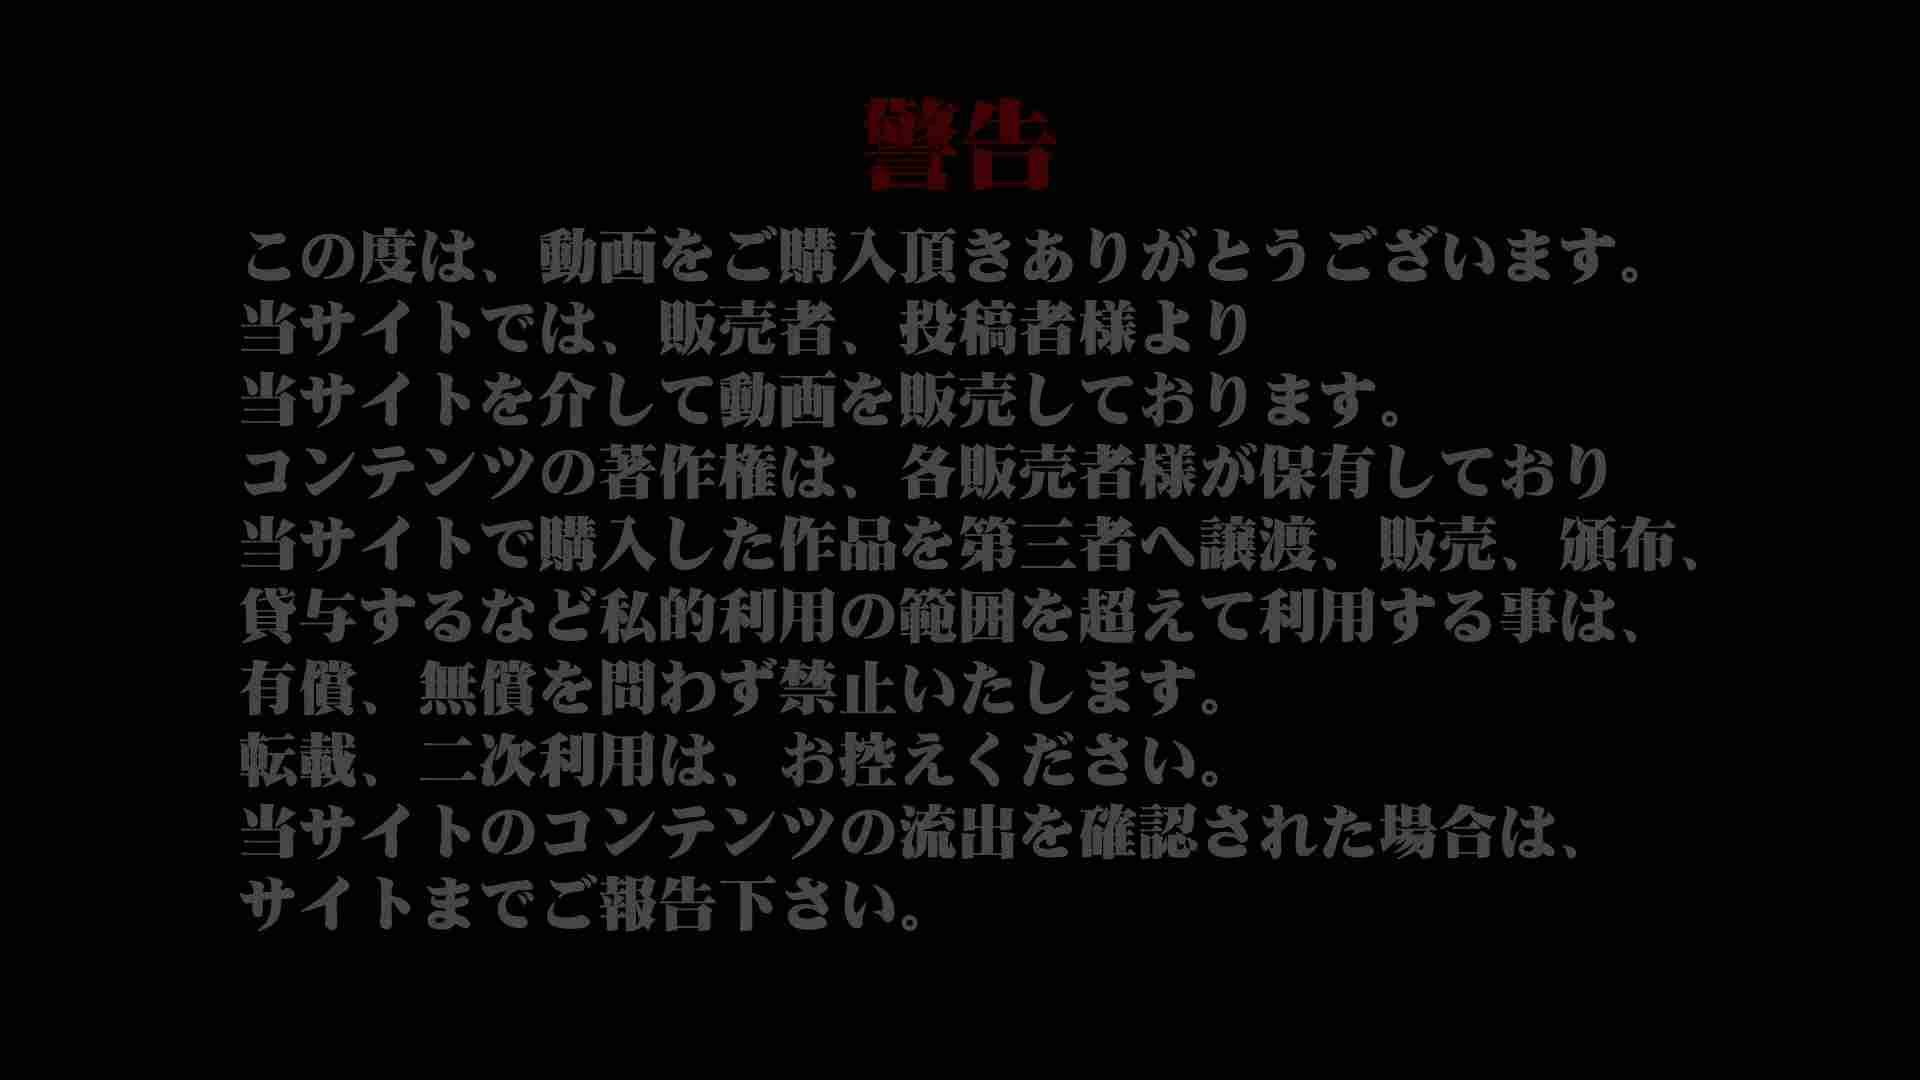 Aquaな露天風呂Vol.886 露天   HなOL  95pic 1